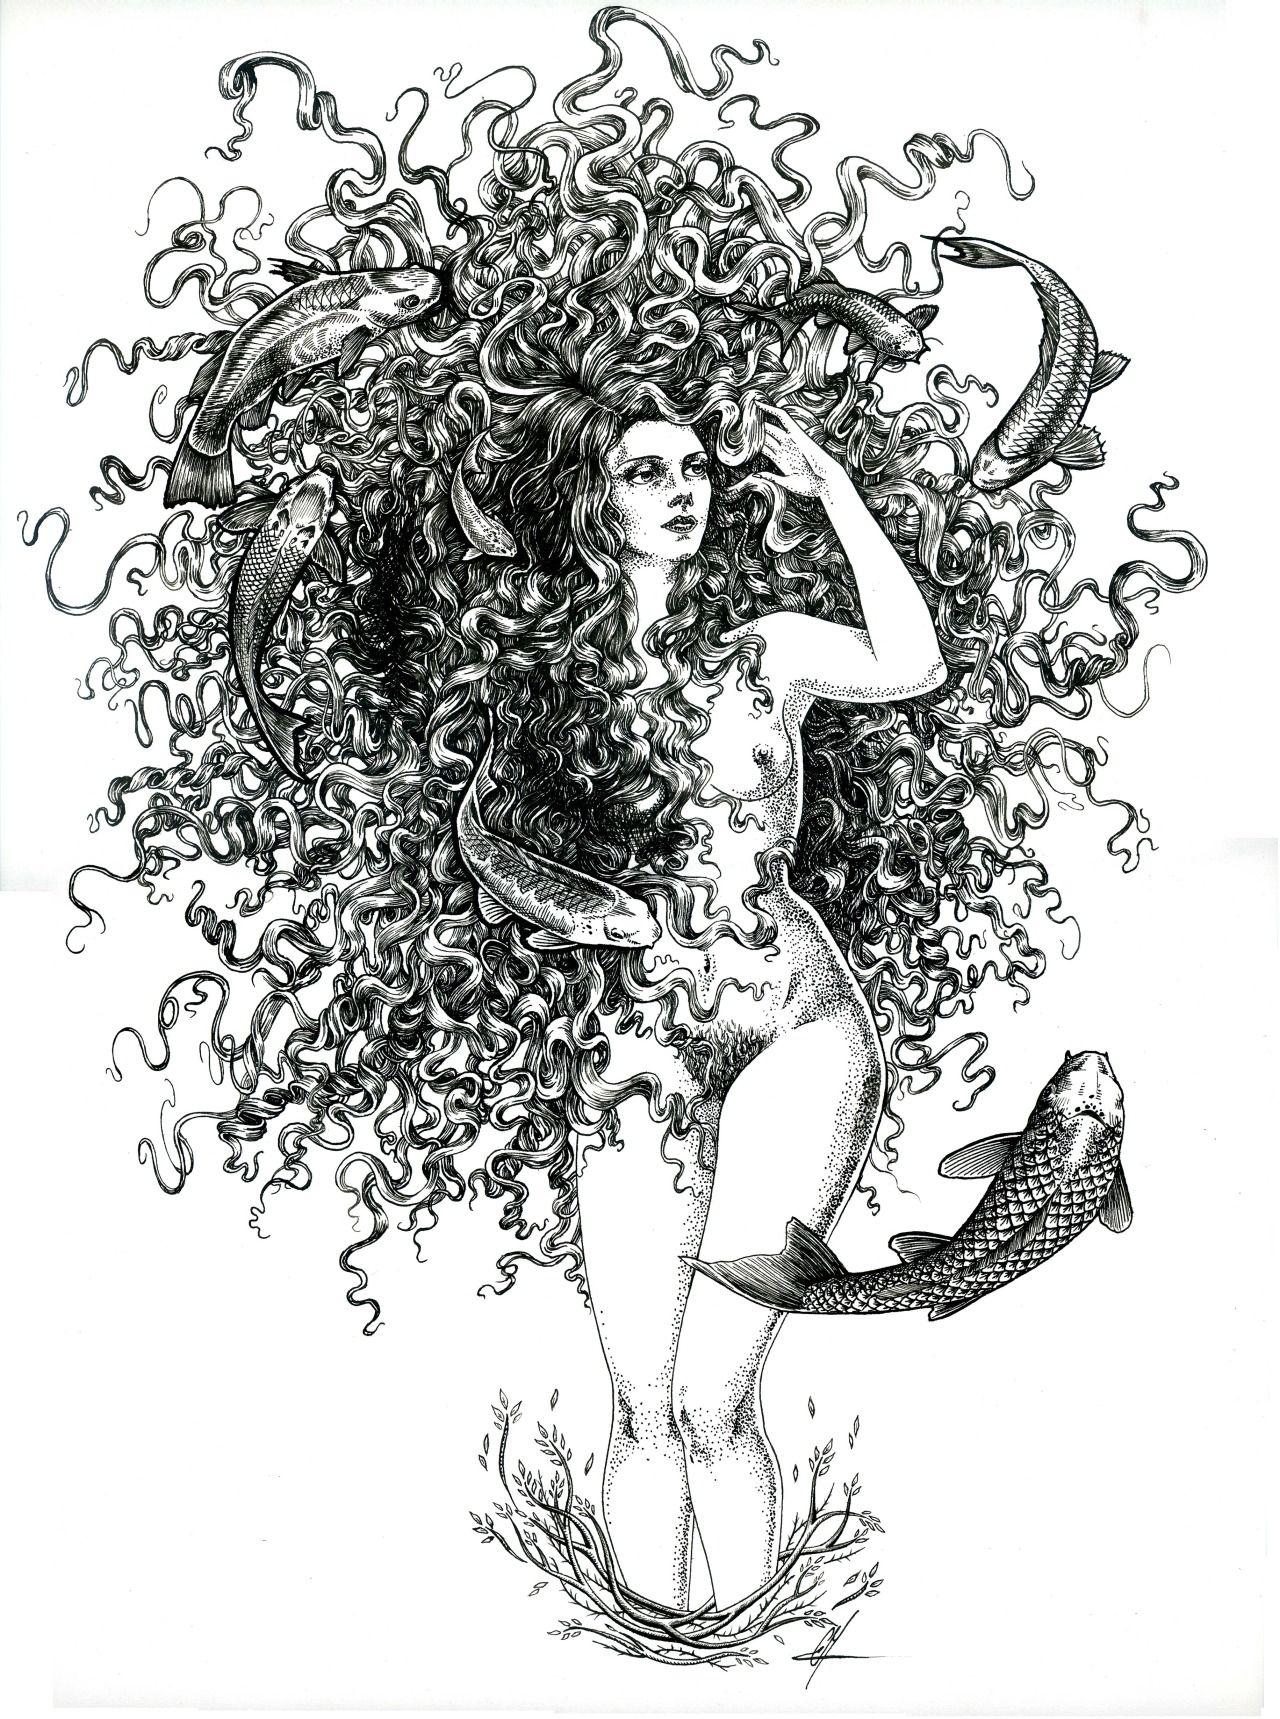 Camille murgue illustrations - Camille dessin ...